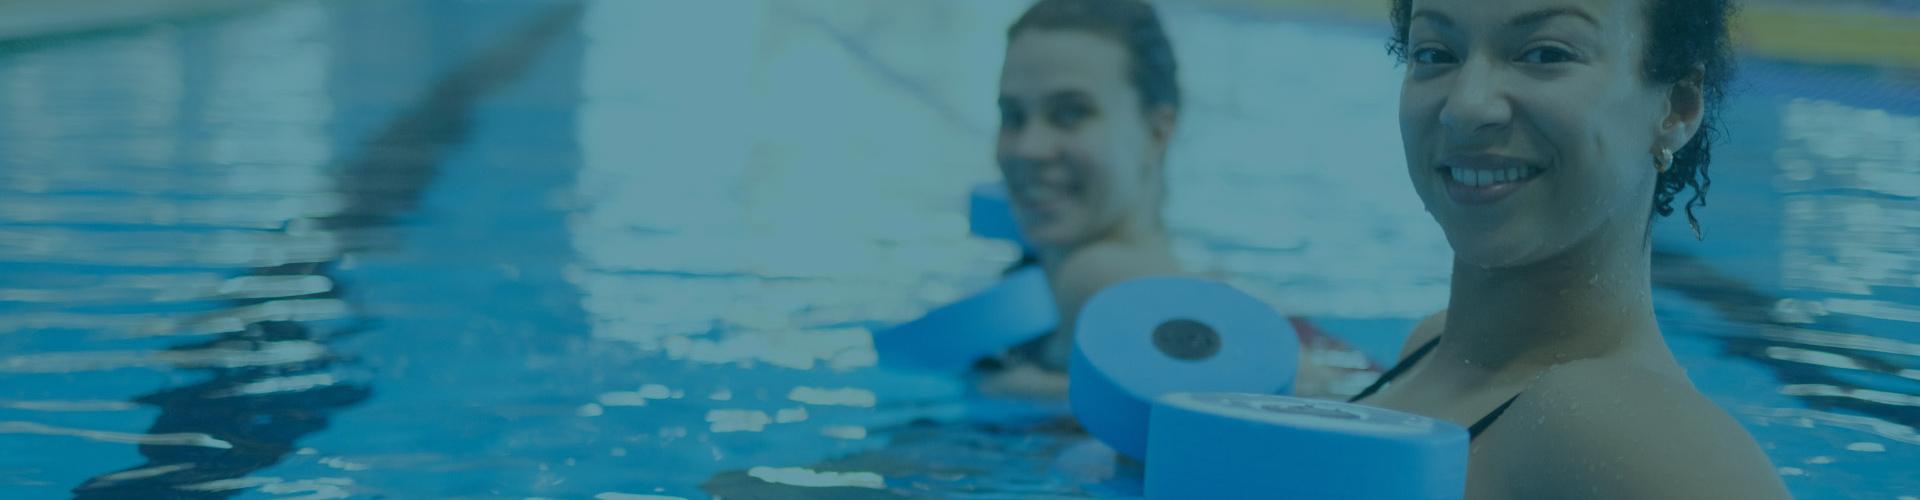 waterwoman background